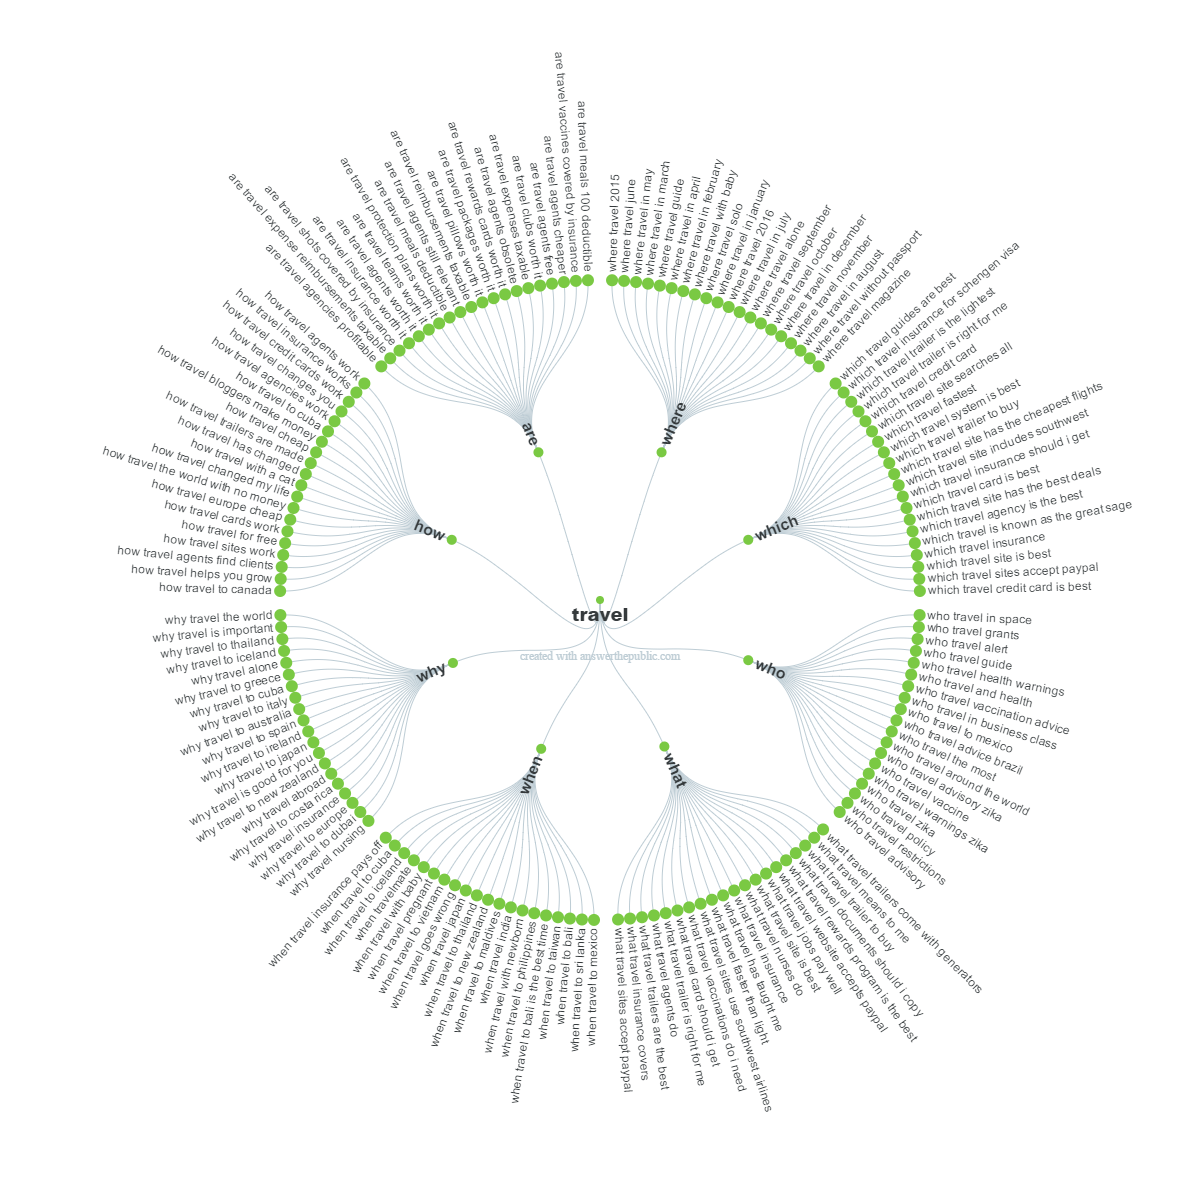 TRAVEL question-visualisation